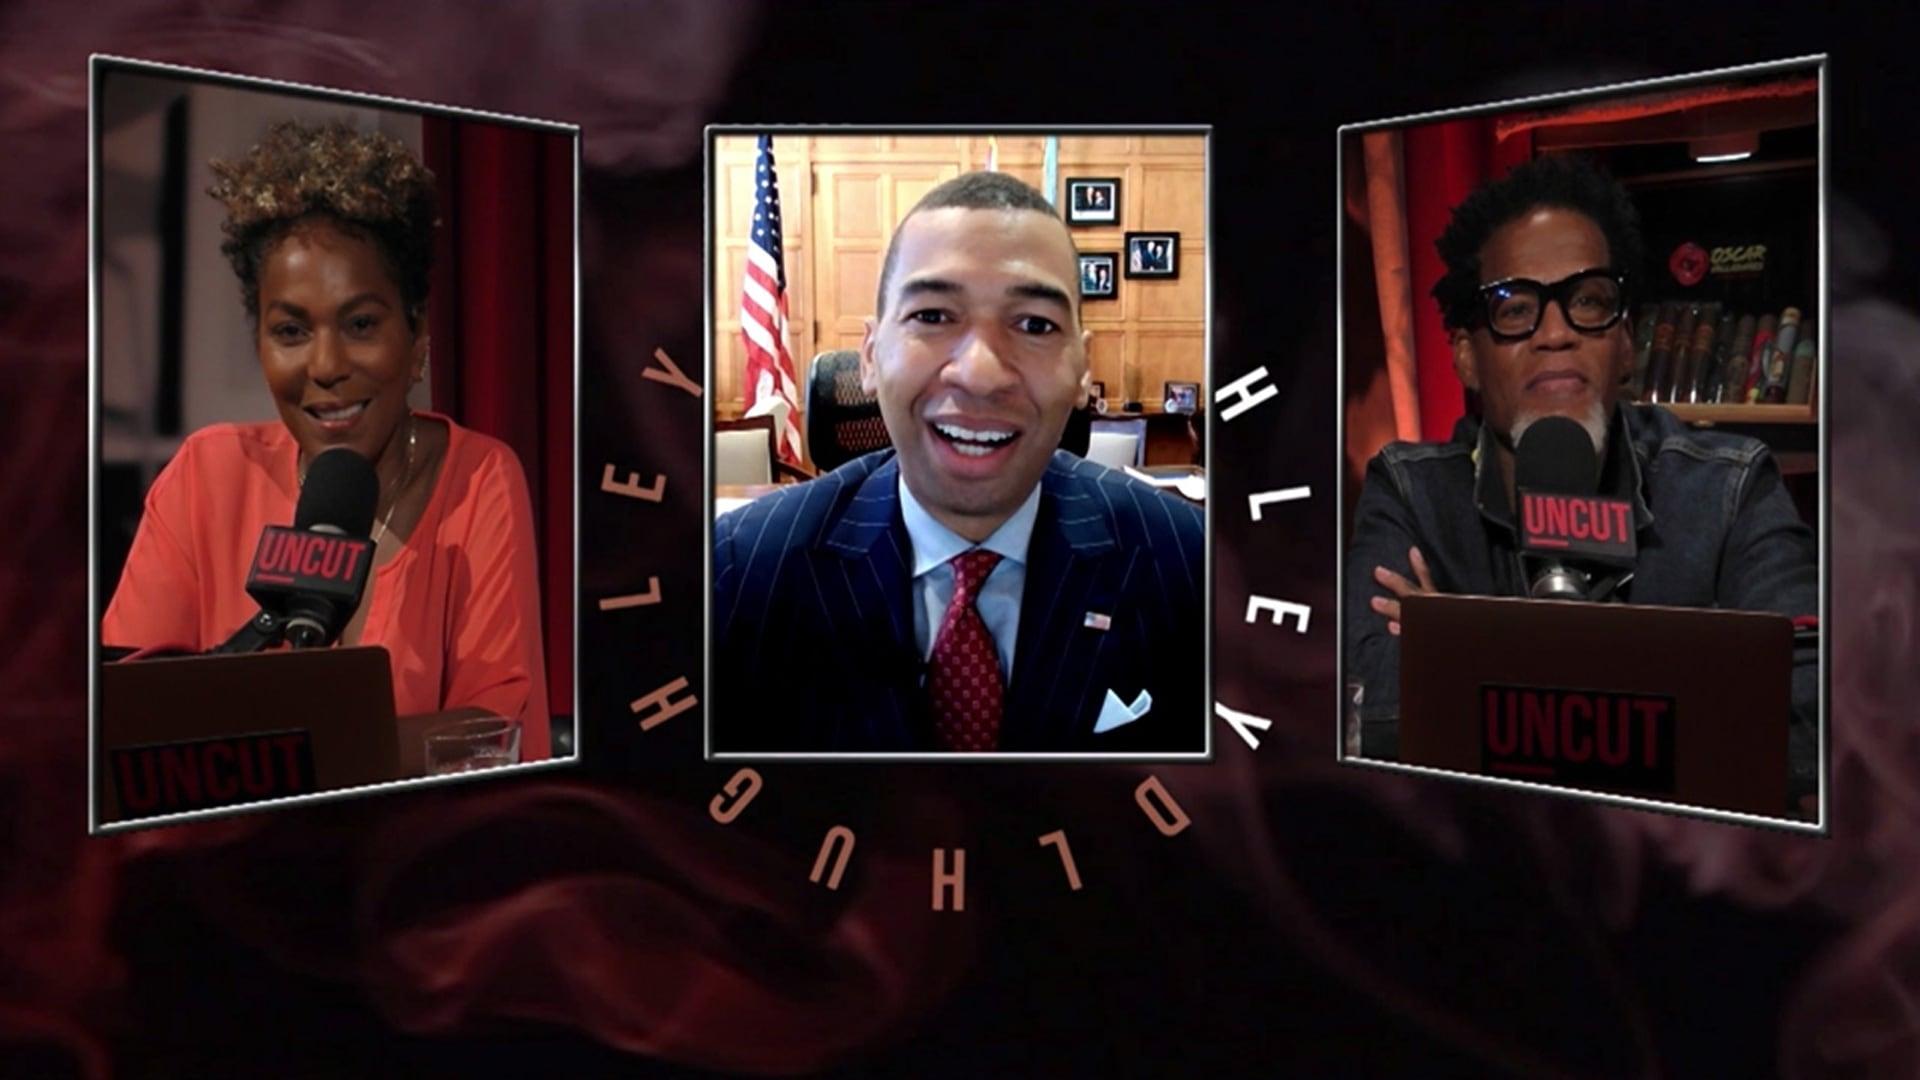 Mayor Steven L. Reed; Sybil Wilkes; Alicia Garza